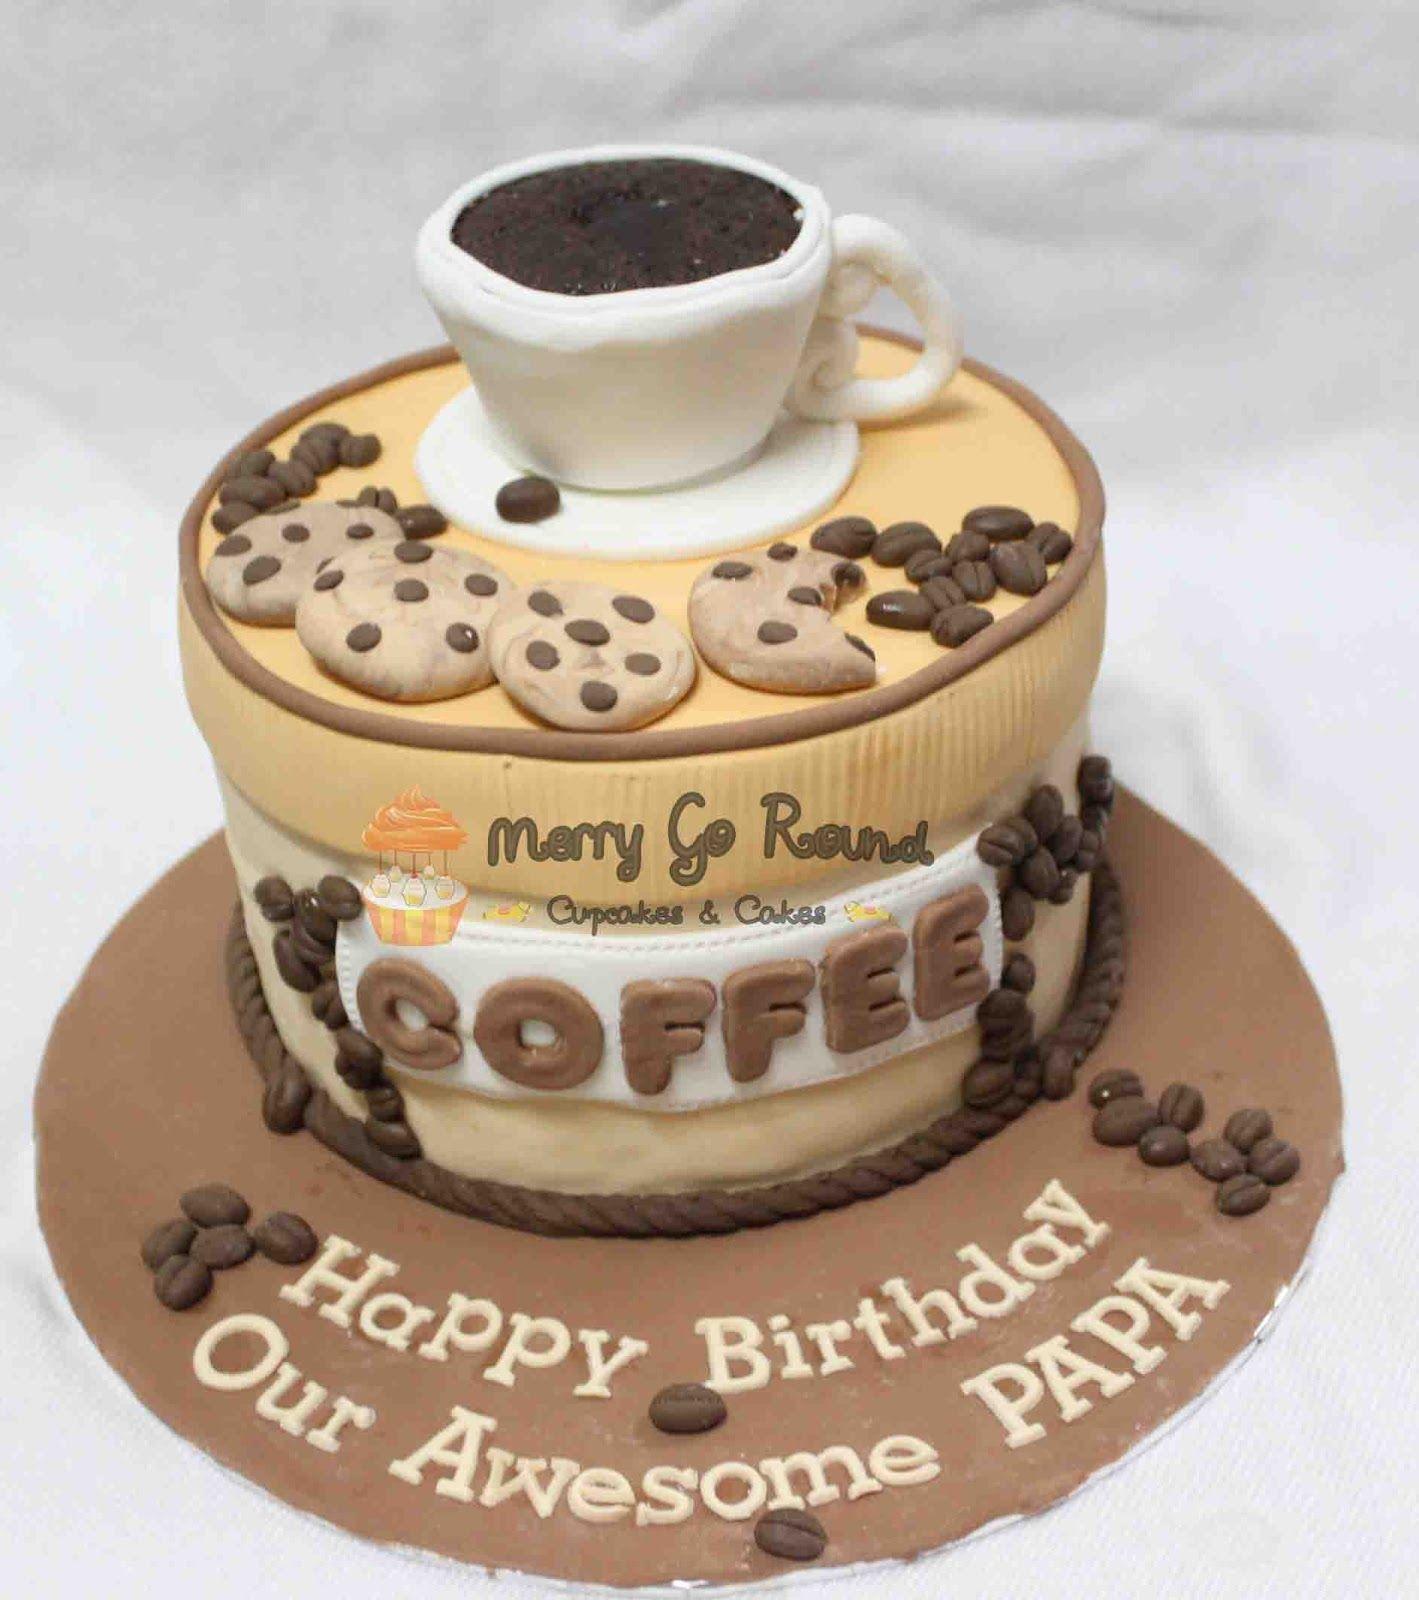 coffee wedding cakes Merry Go Round Cupcakes & Cakes